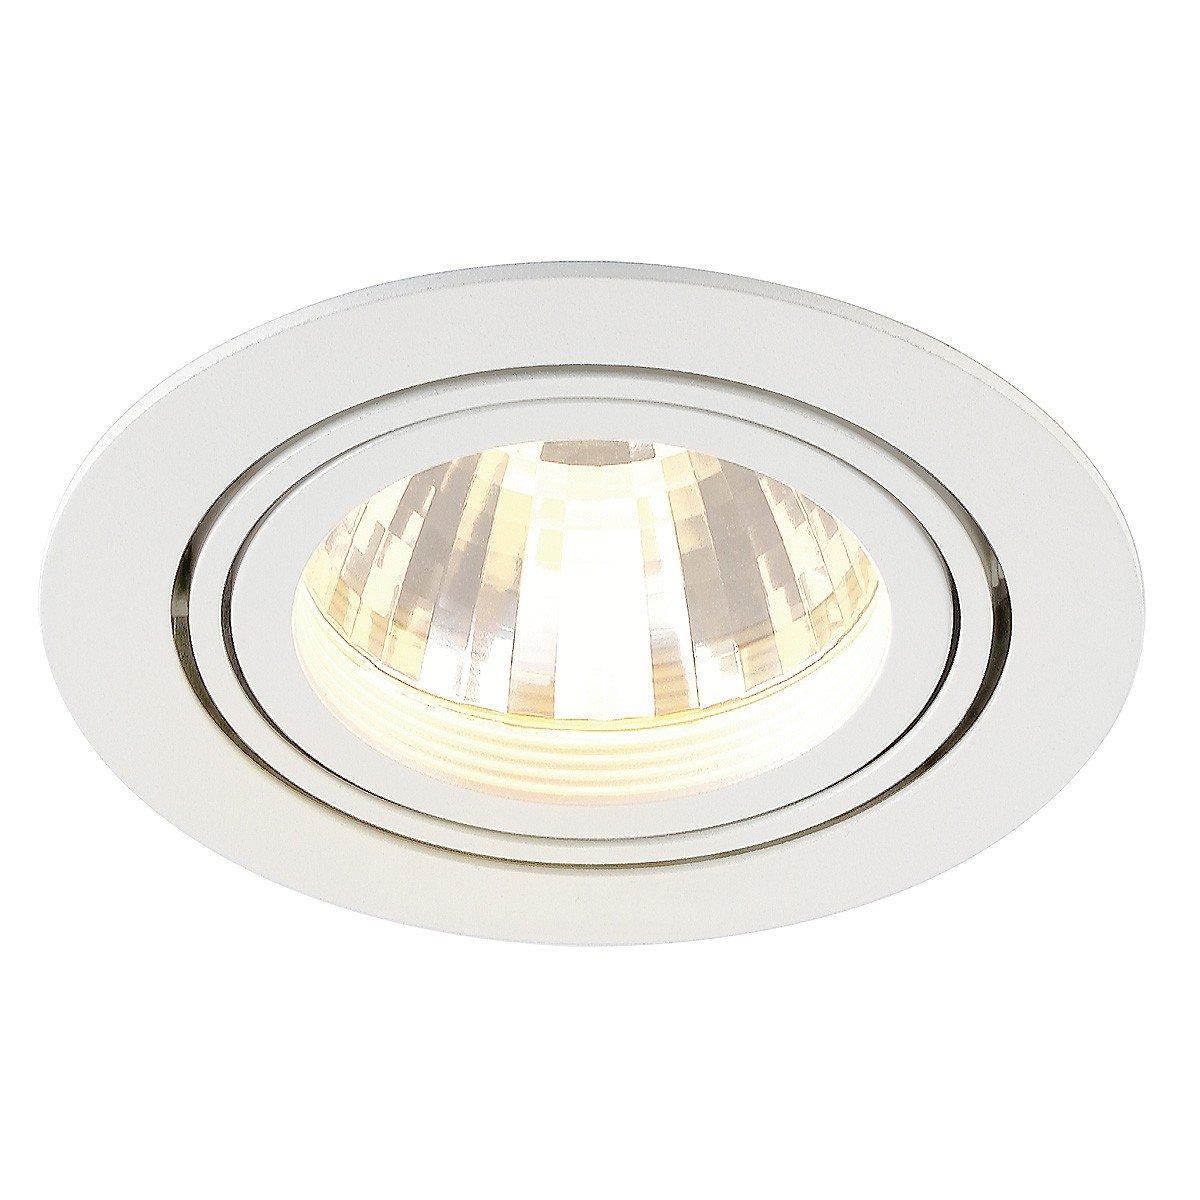 SLV New Tria LED Disk Downlight, Rund, 2700 K, 60 Grad, weiß 113591